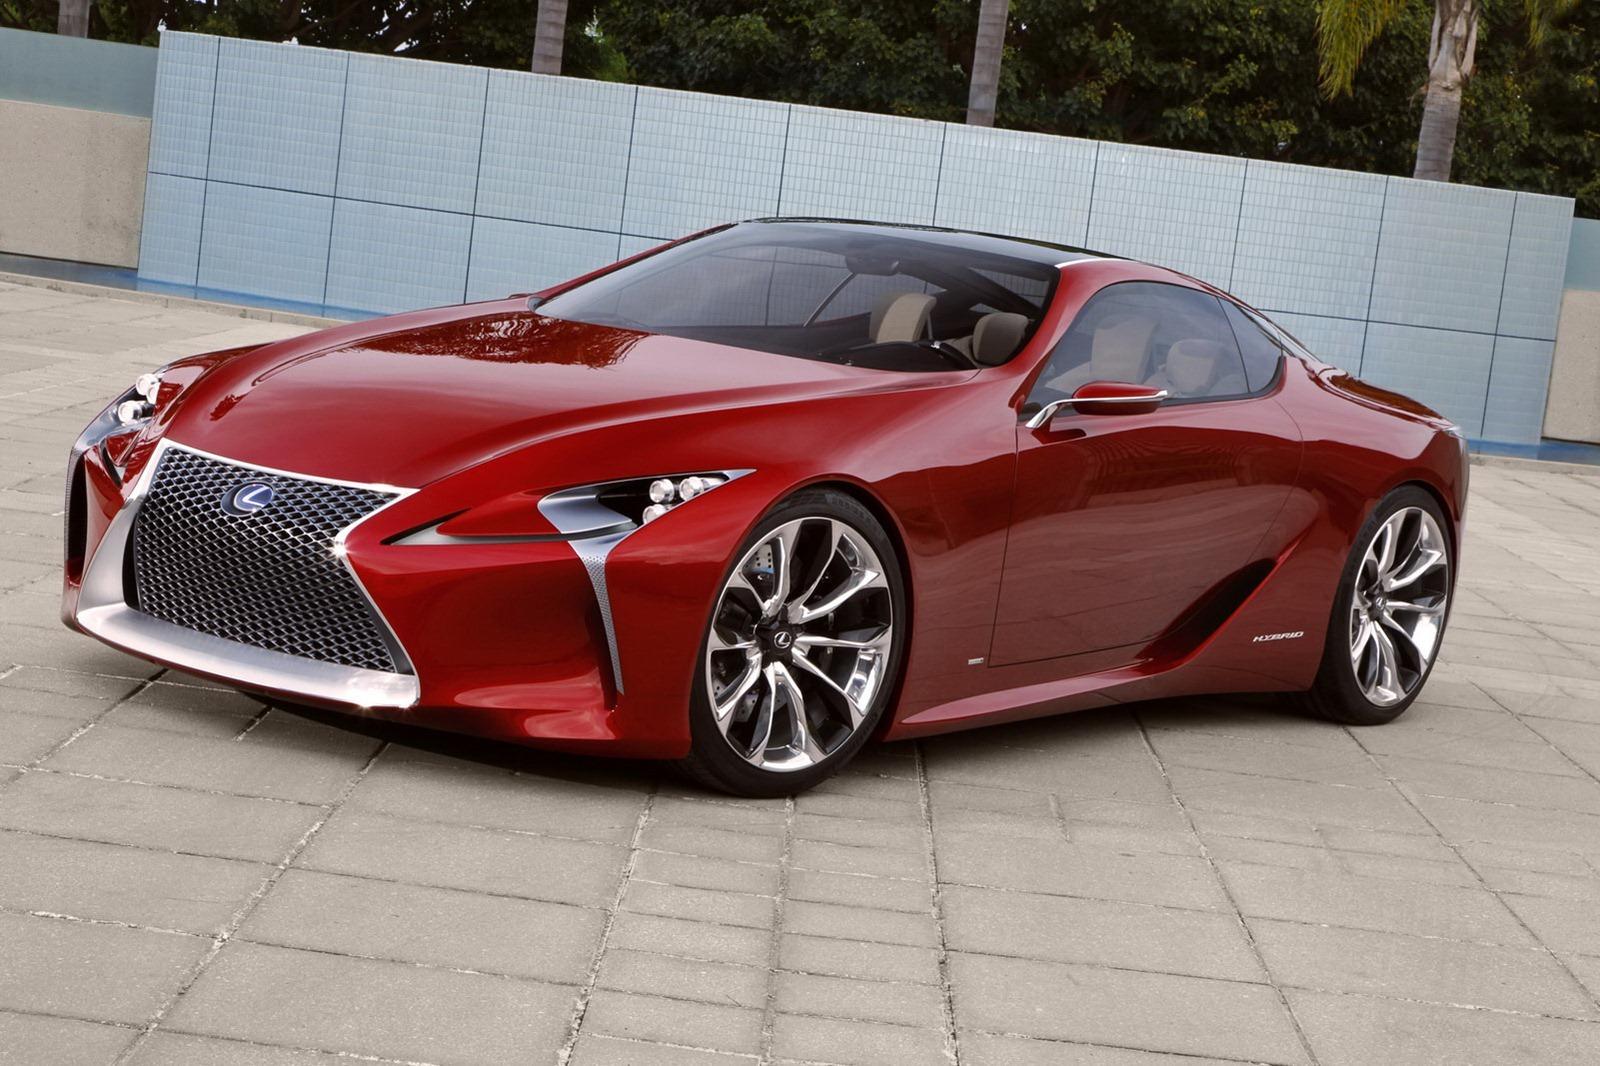 Lexus-lf-lc-concept-6